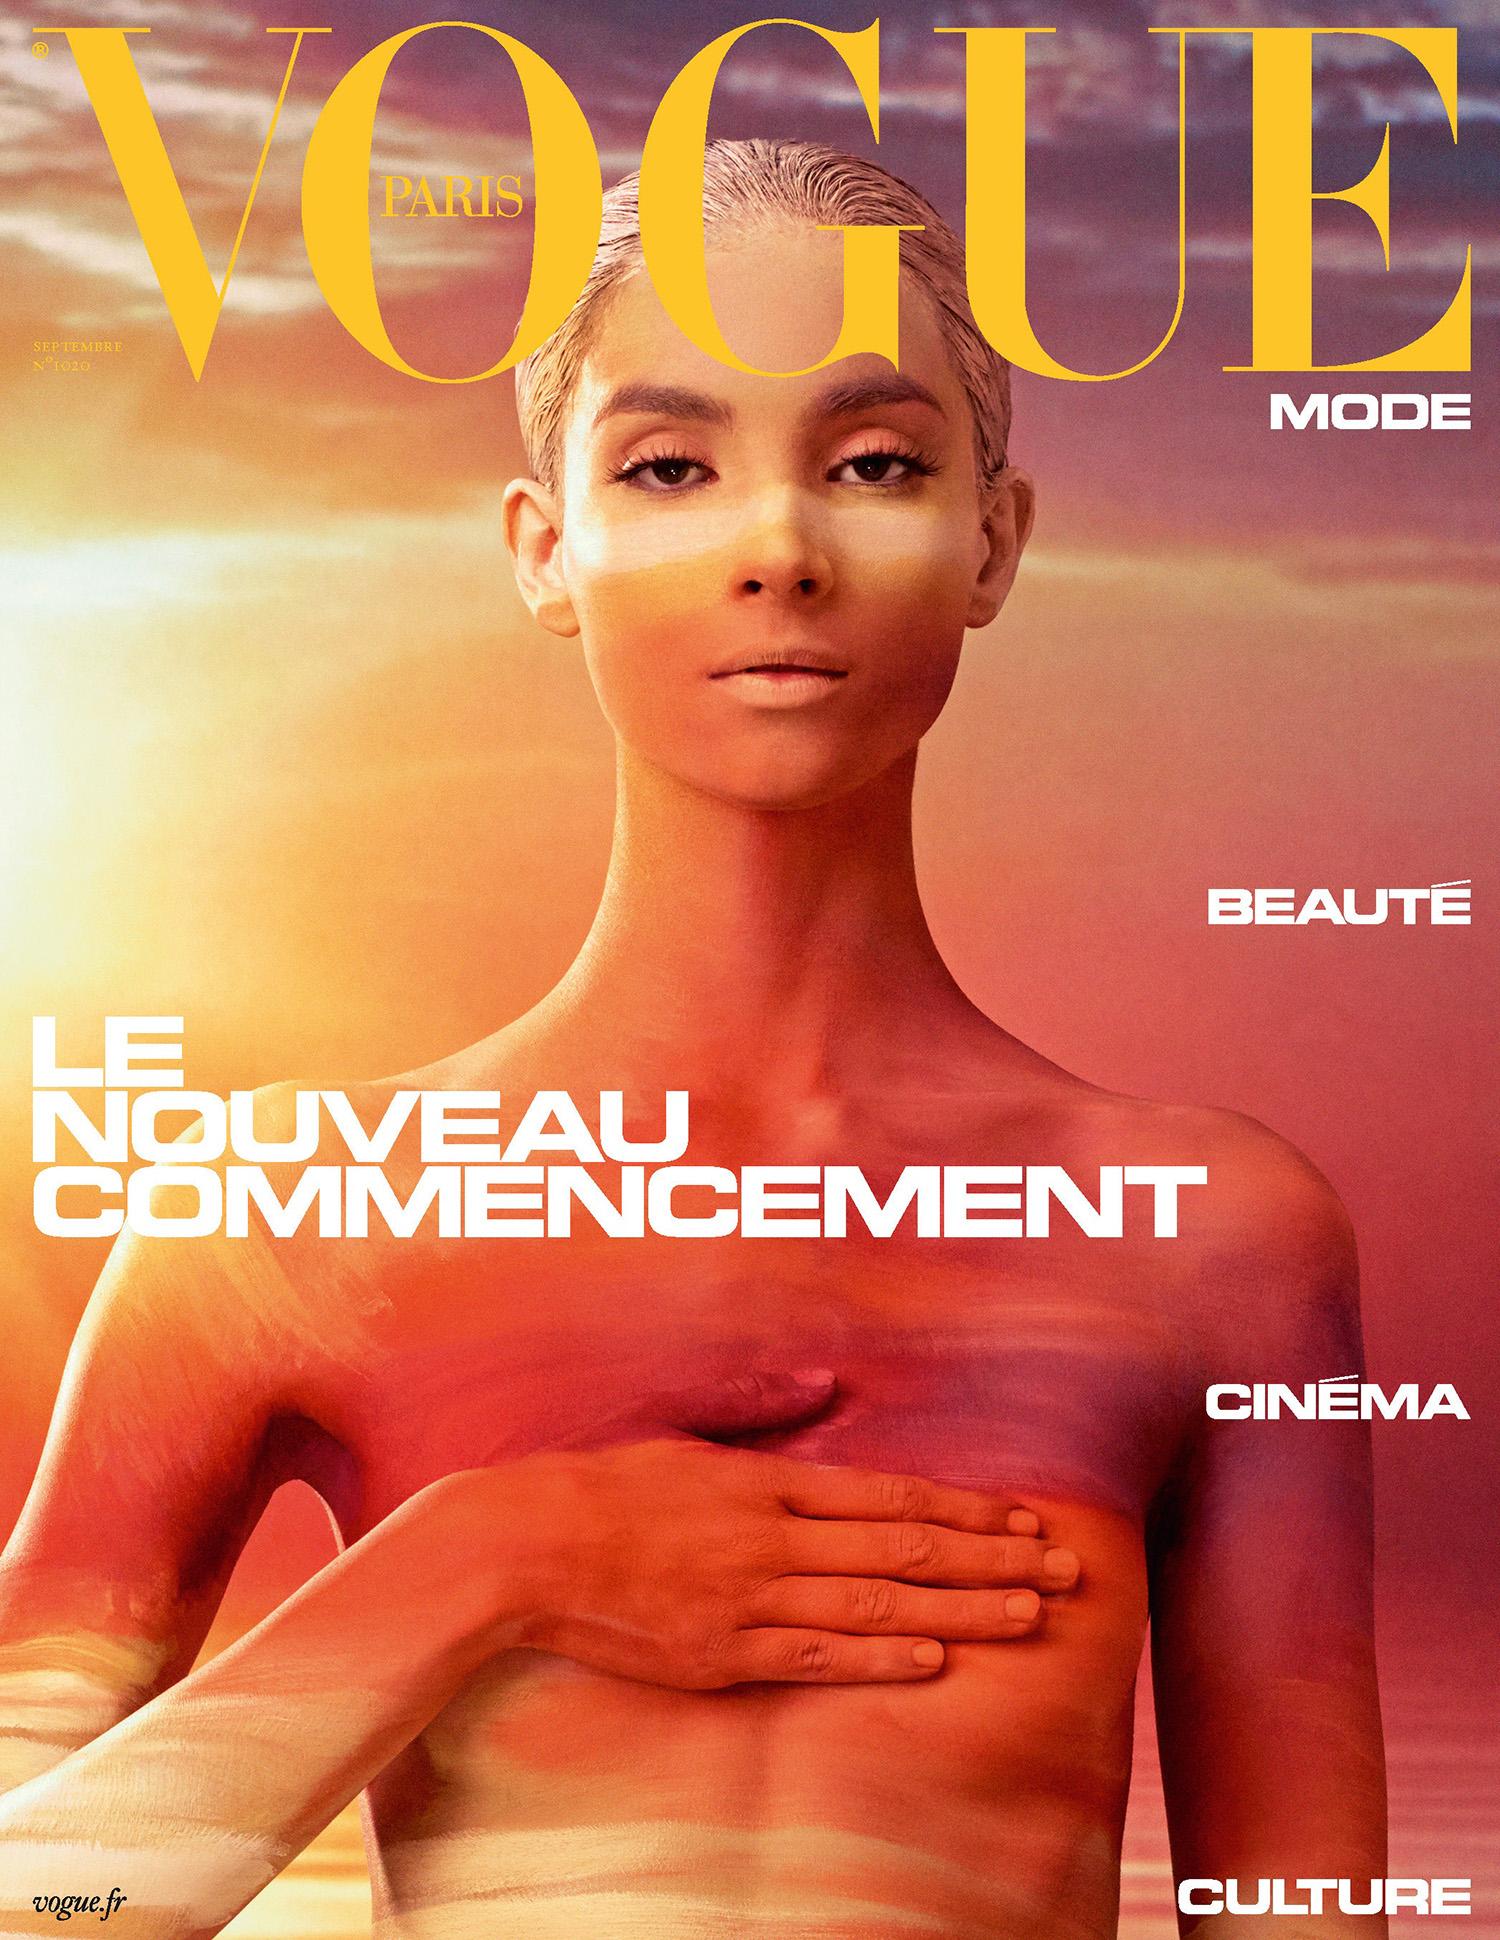 Tindi Mar covers Vogue Paris September 2021 by Mikael Jansson